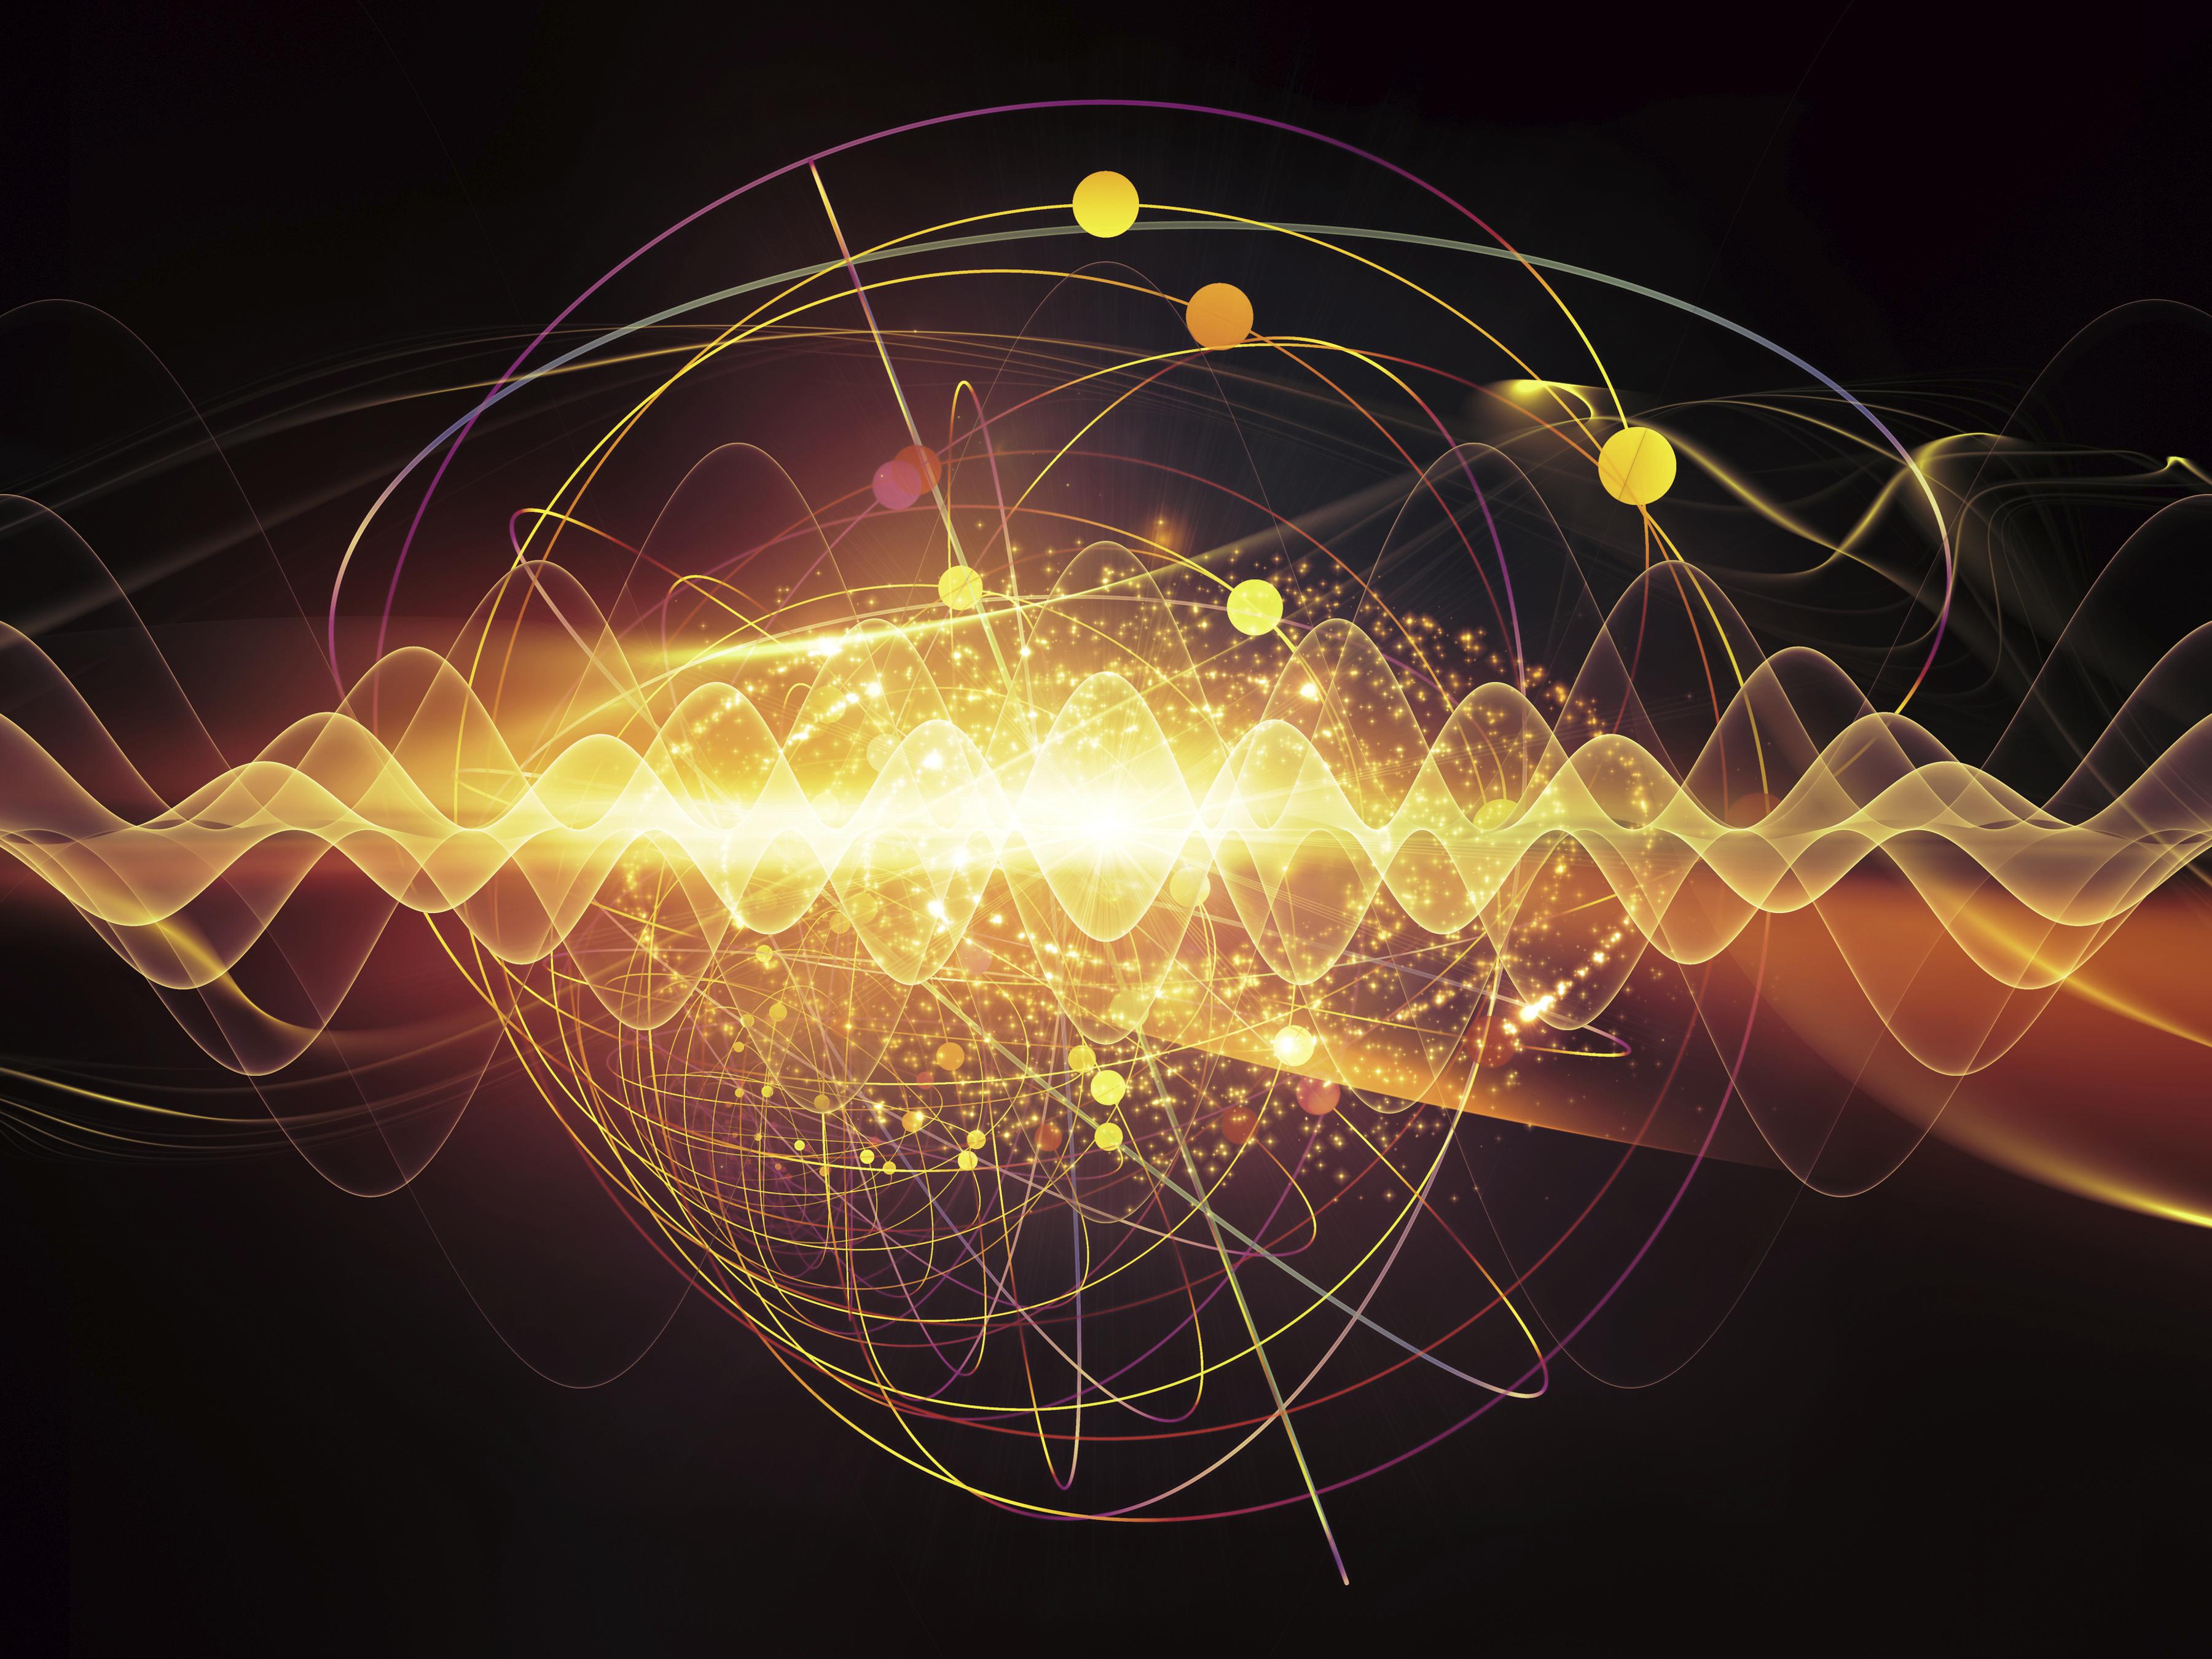 Quantum security, sicurezza Quantistica, crittografia, cifratura